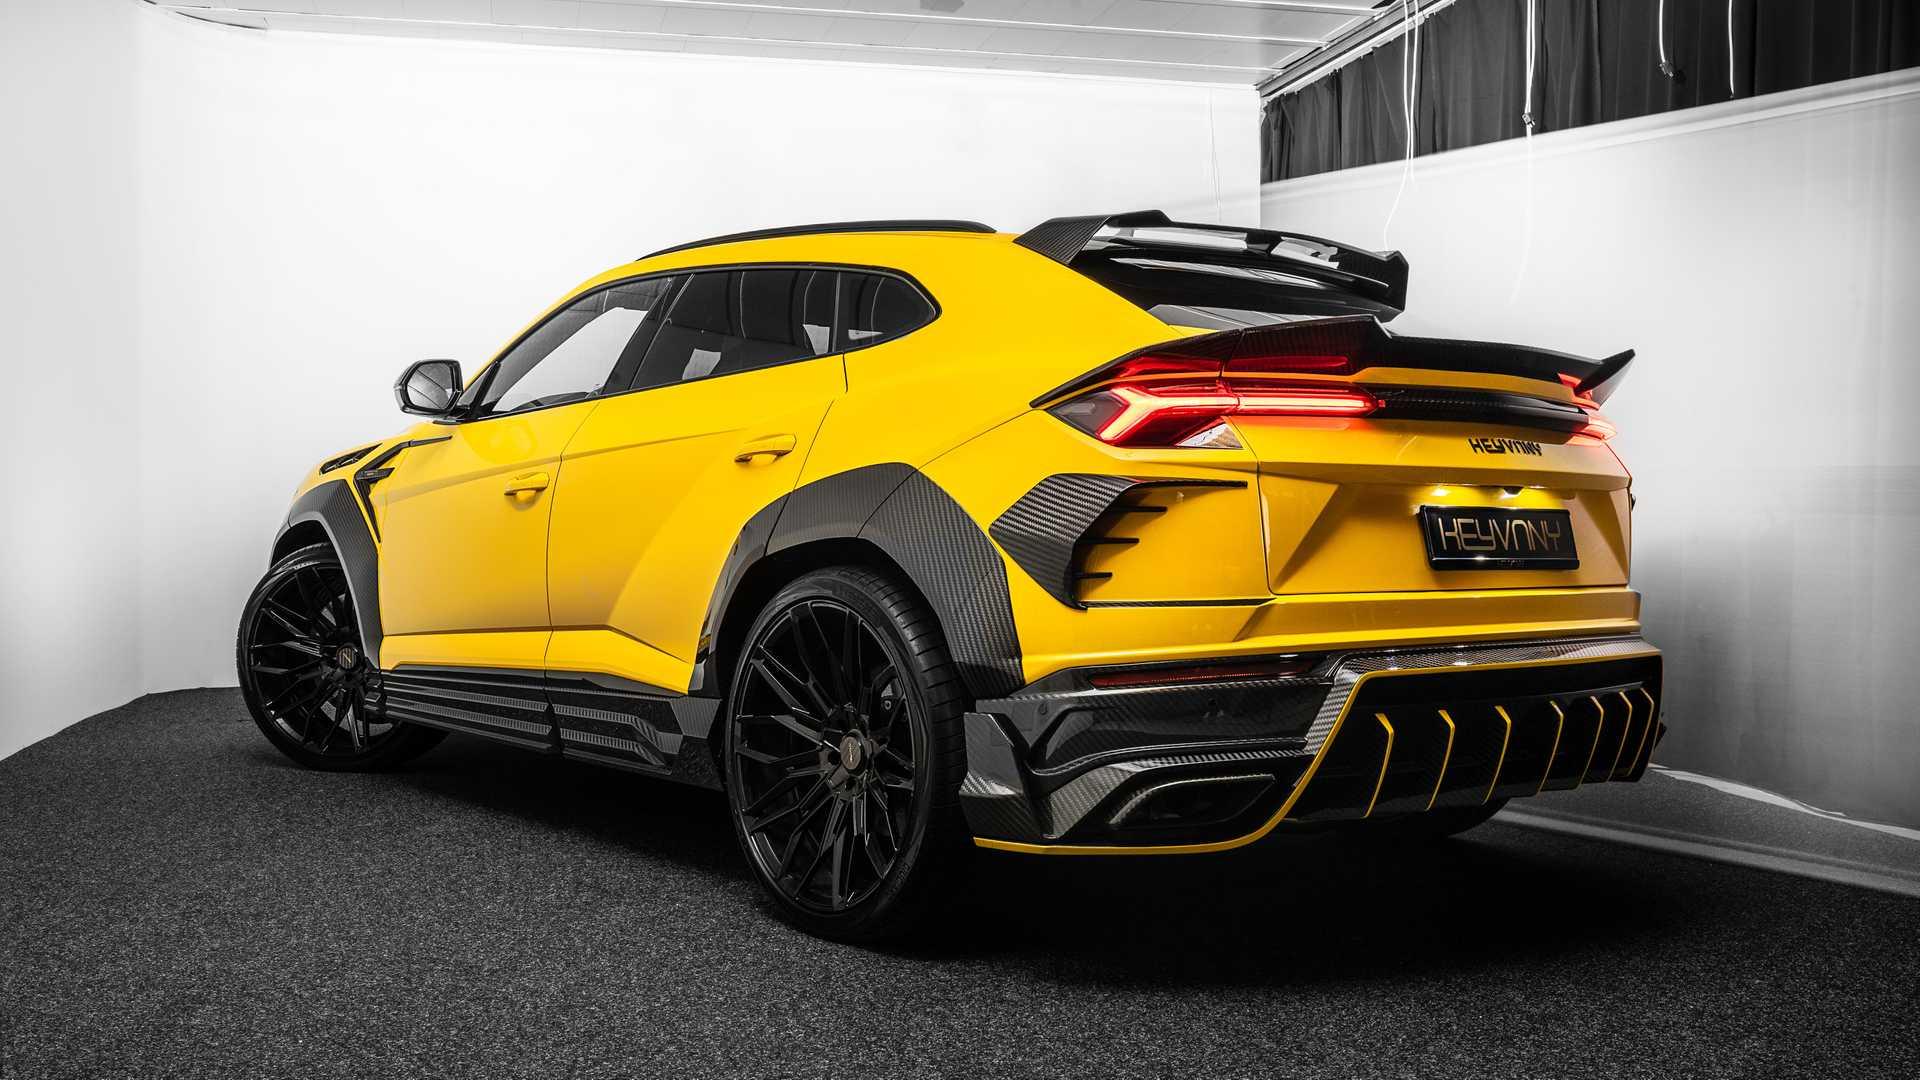 Lamborghini-Urus-by-Keyvany-6